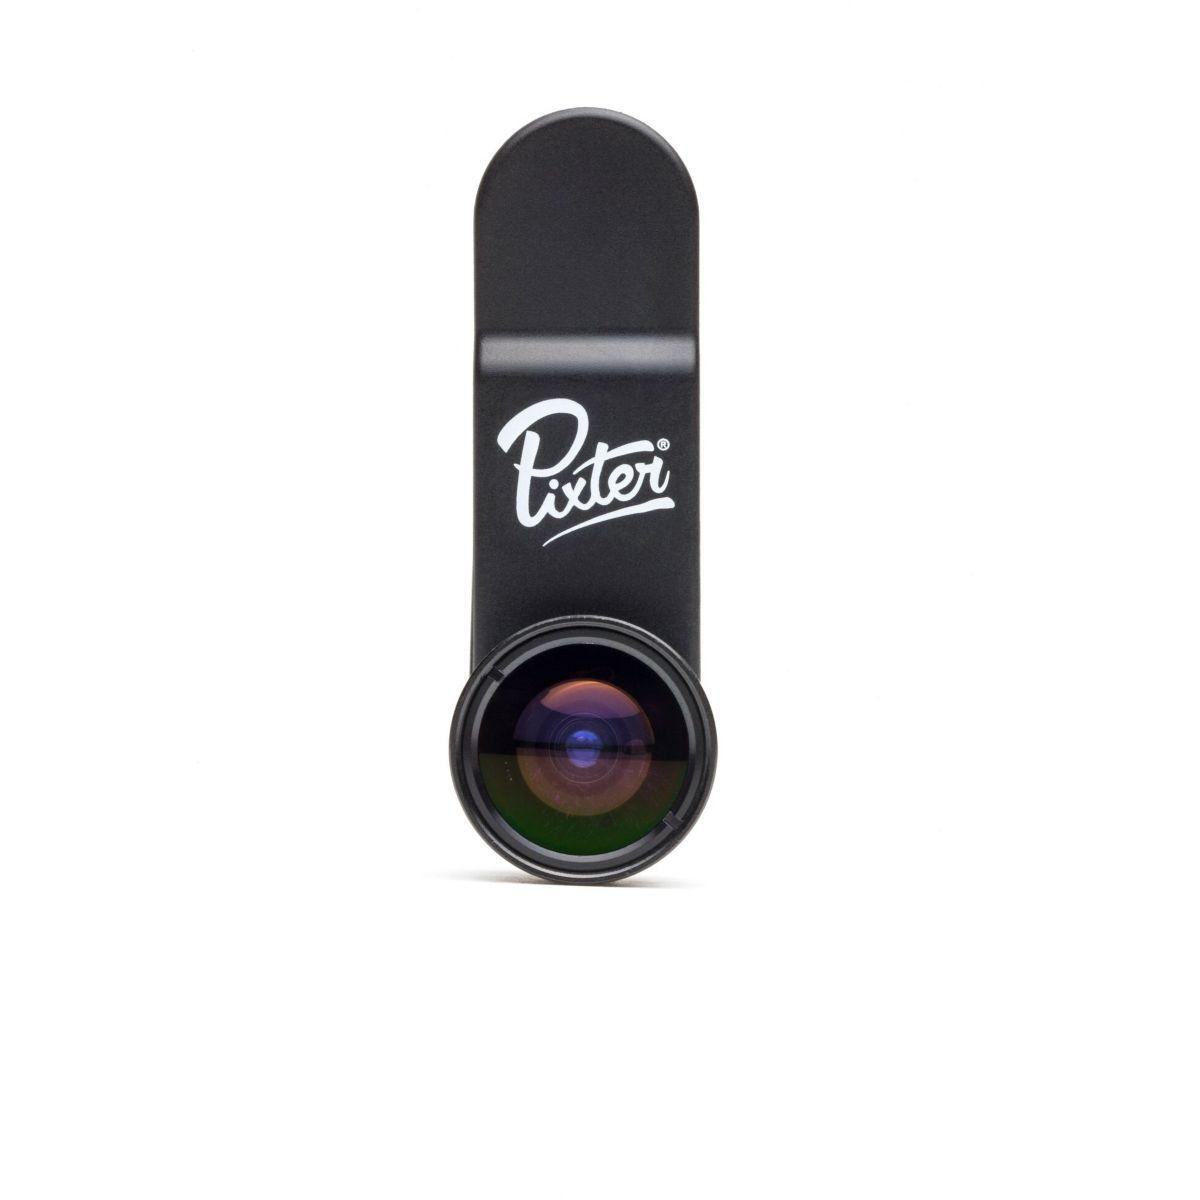 Objectif smartphone pixter objectif pour smartphone fisheye - livraison offerte : code liv (photo)